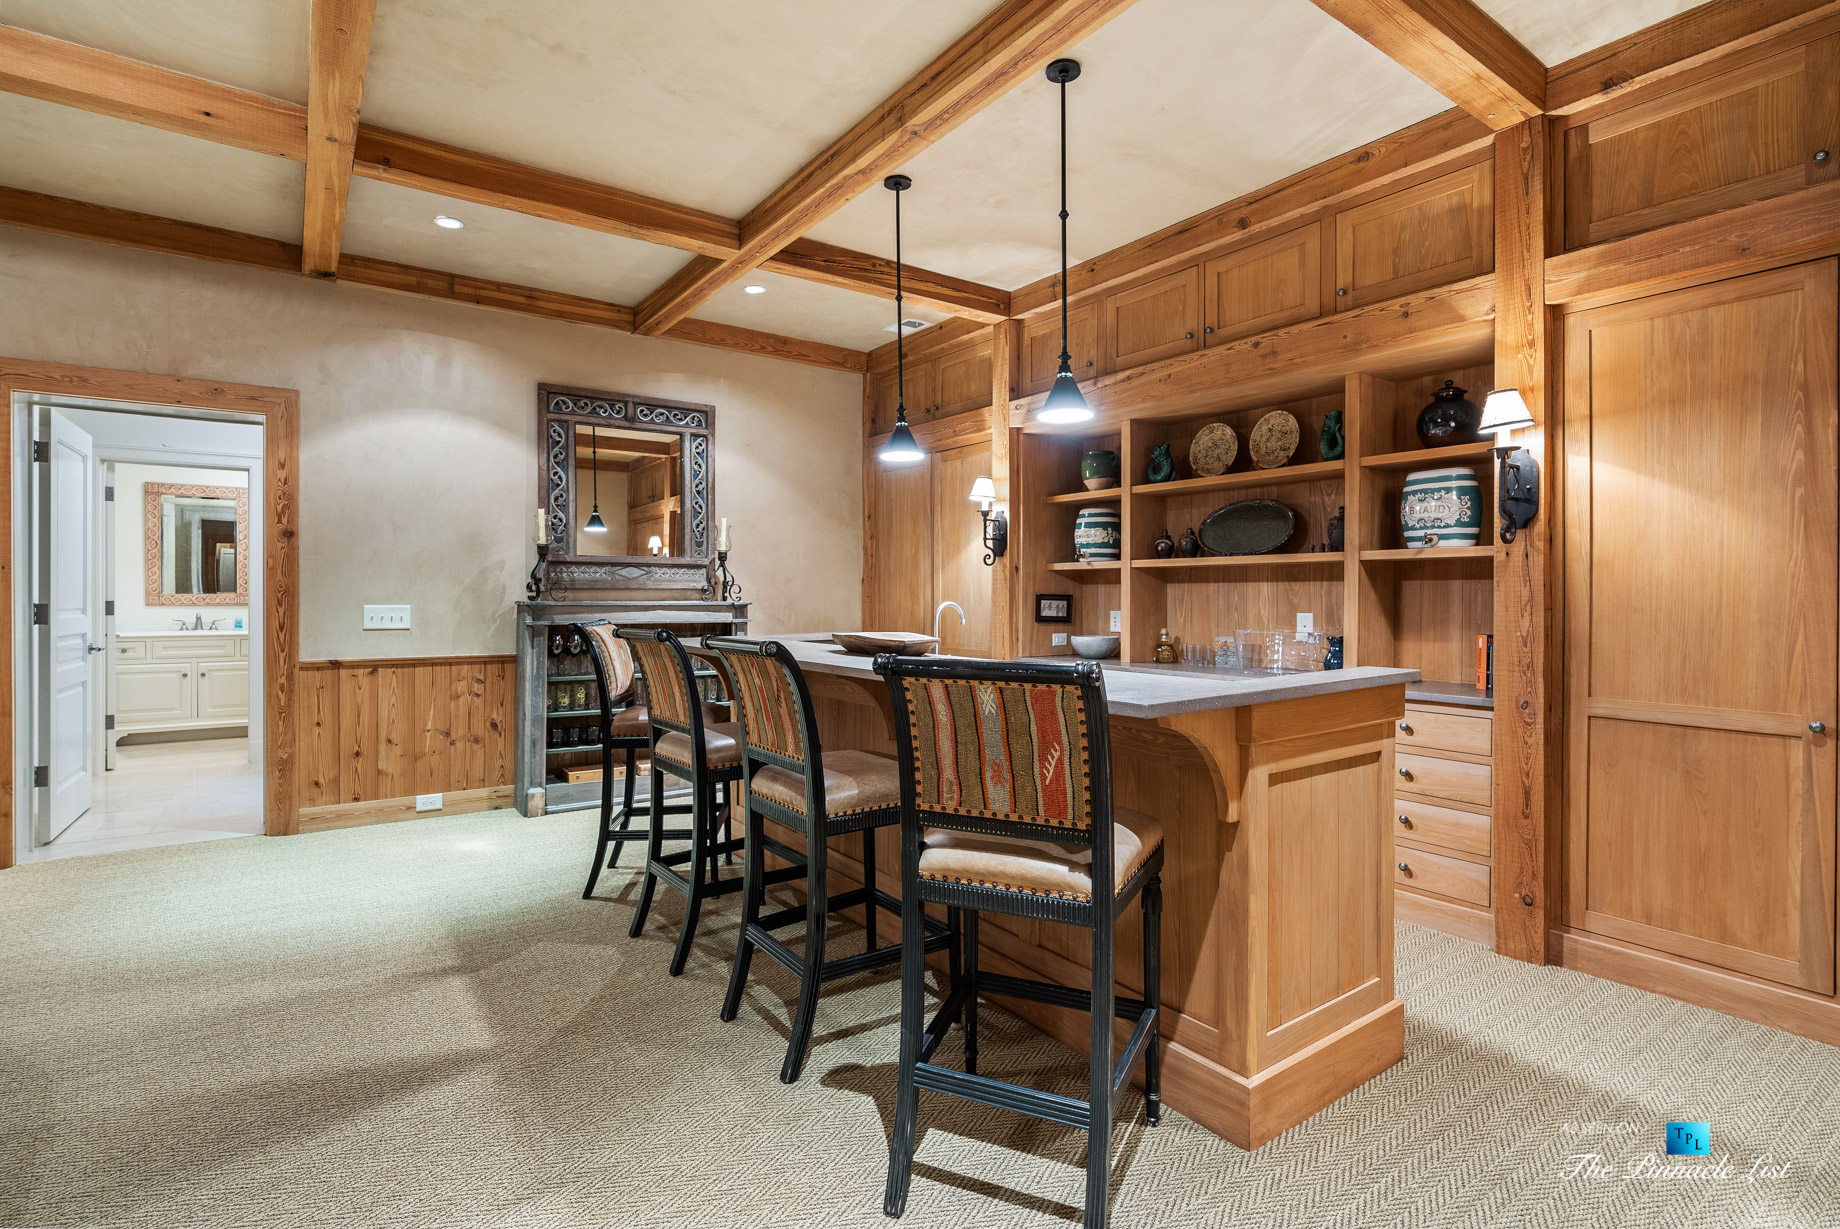 439 Blackland Rd NW, Atlanta, GA, USA - Bar - Luxury Real Estate - Tuxedo Park Mediterranean Mansion Home